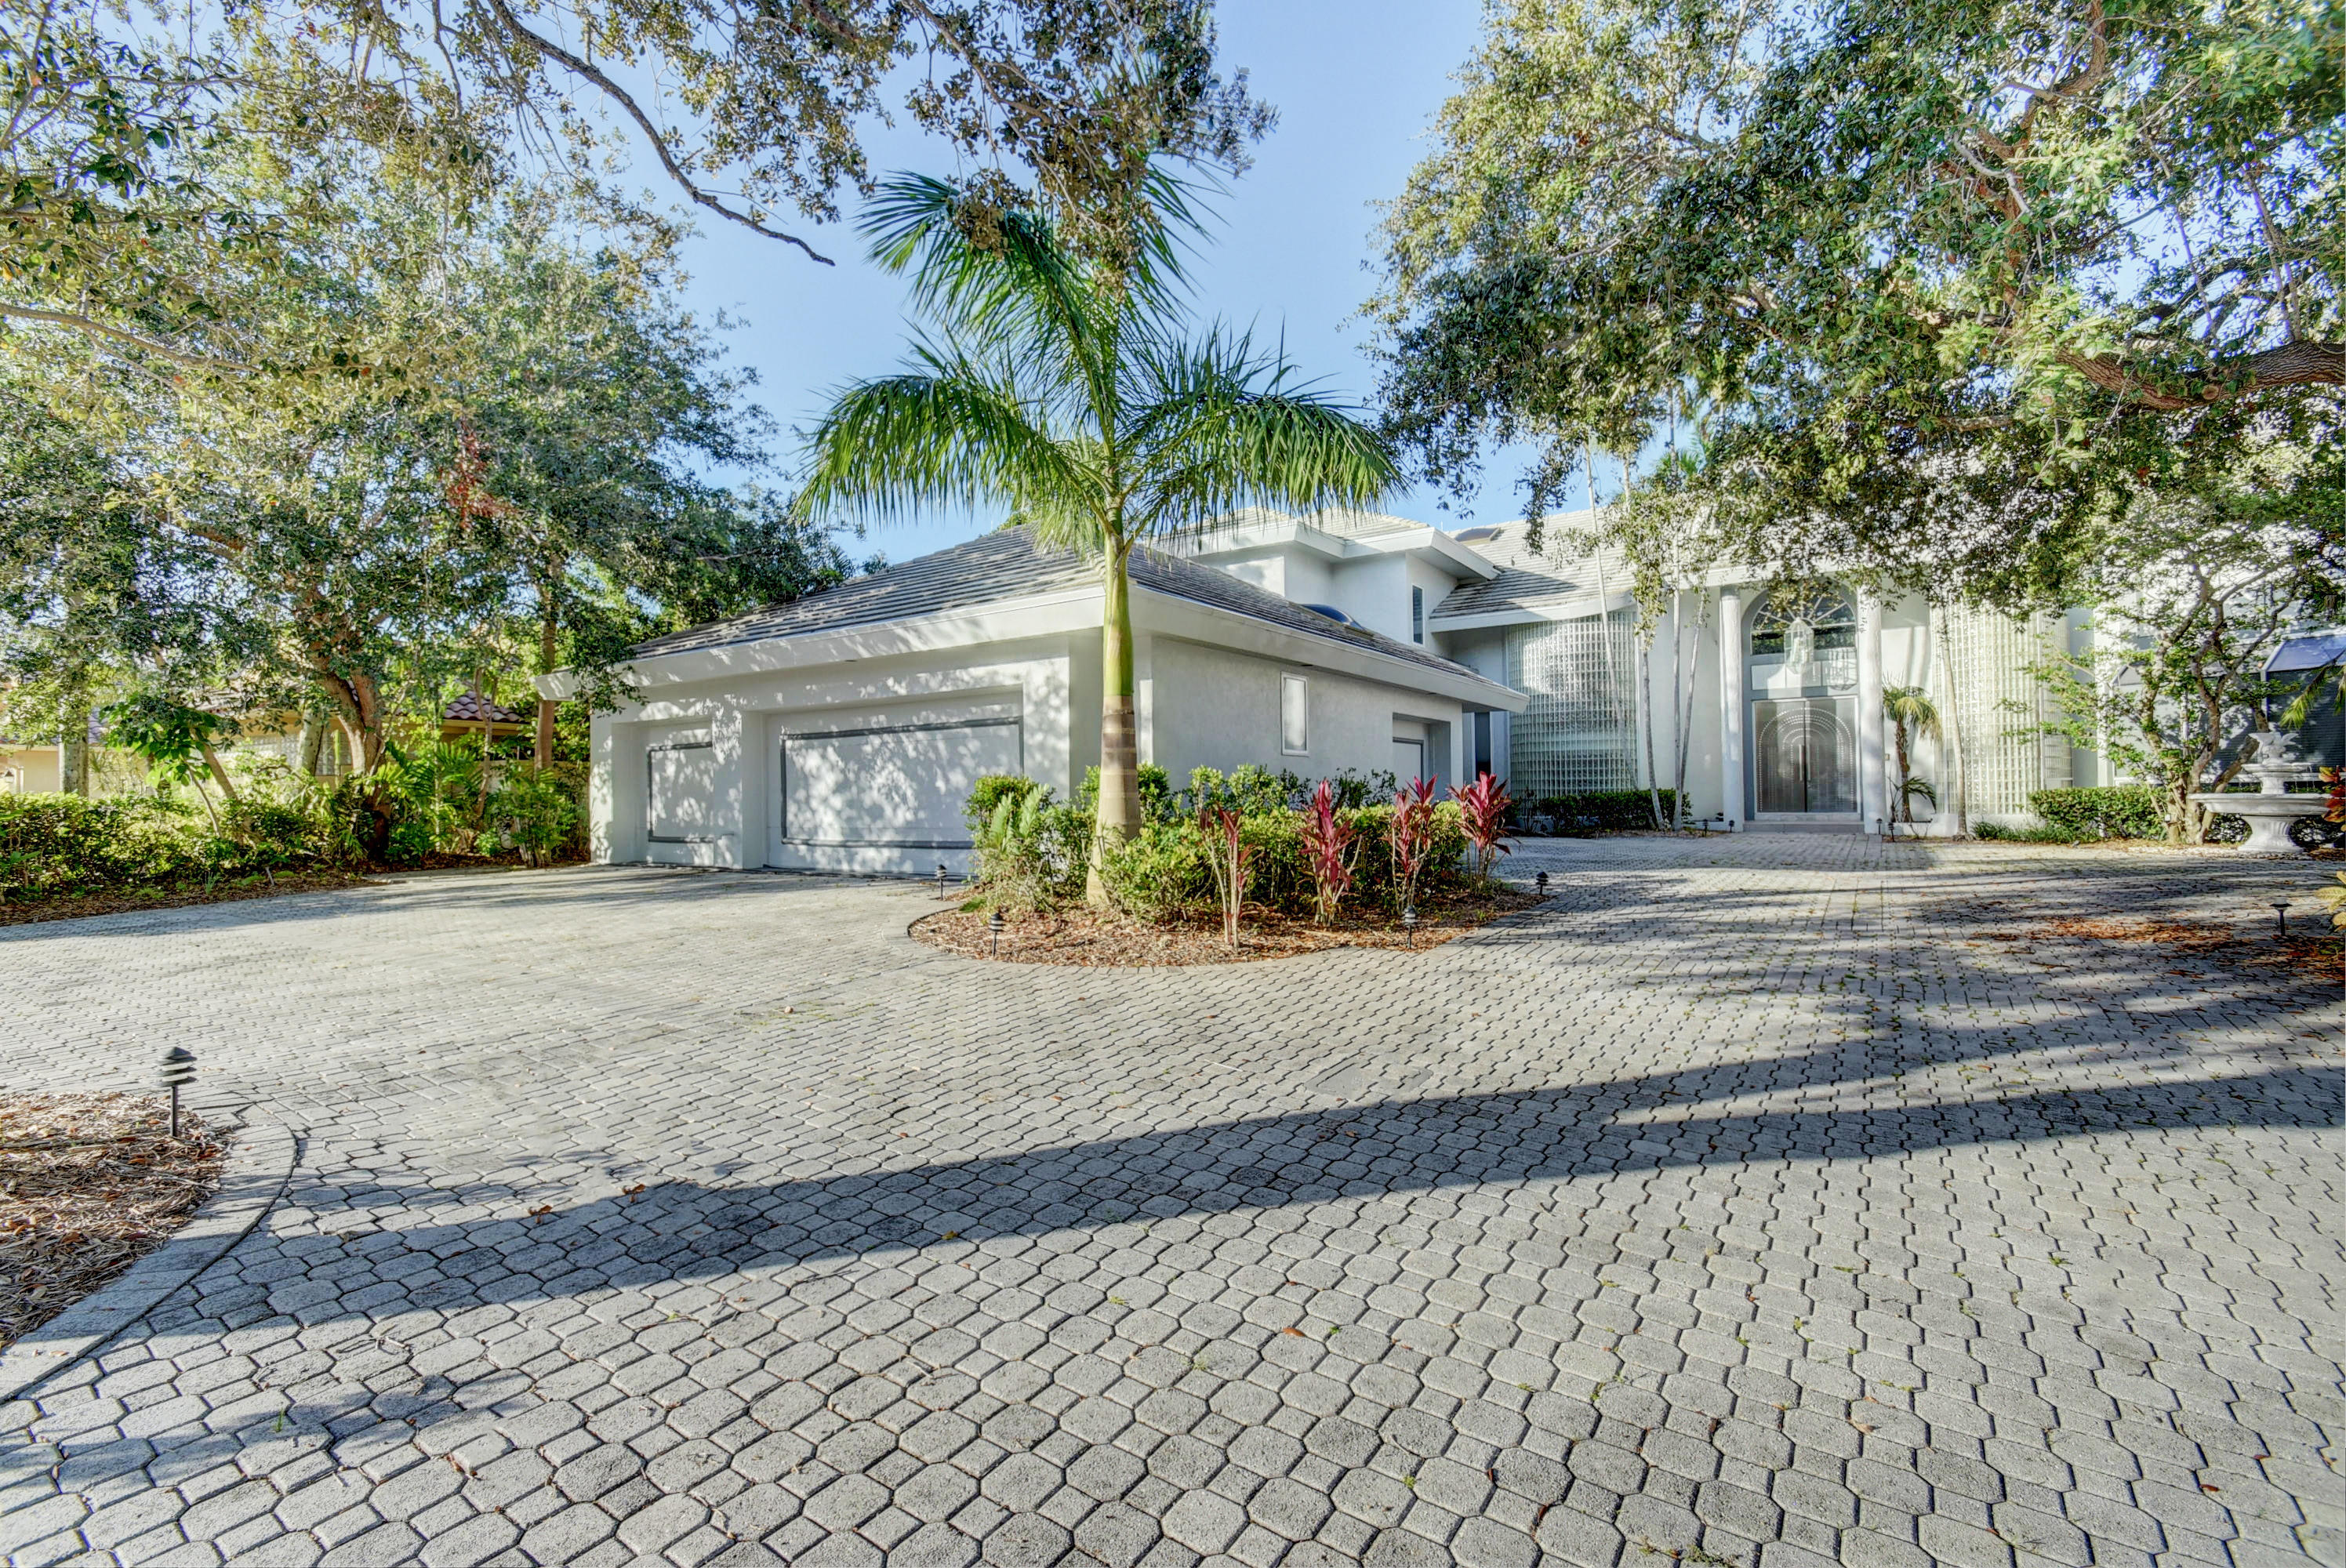 7809 Afton Villa Court Boca Raton, FL 33433 RX-10382281